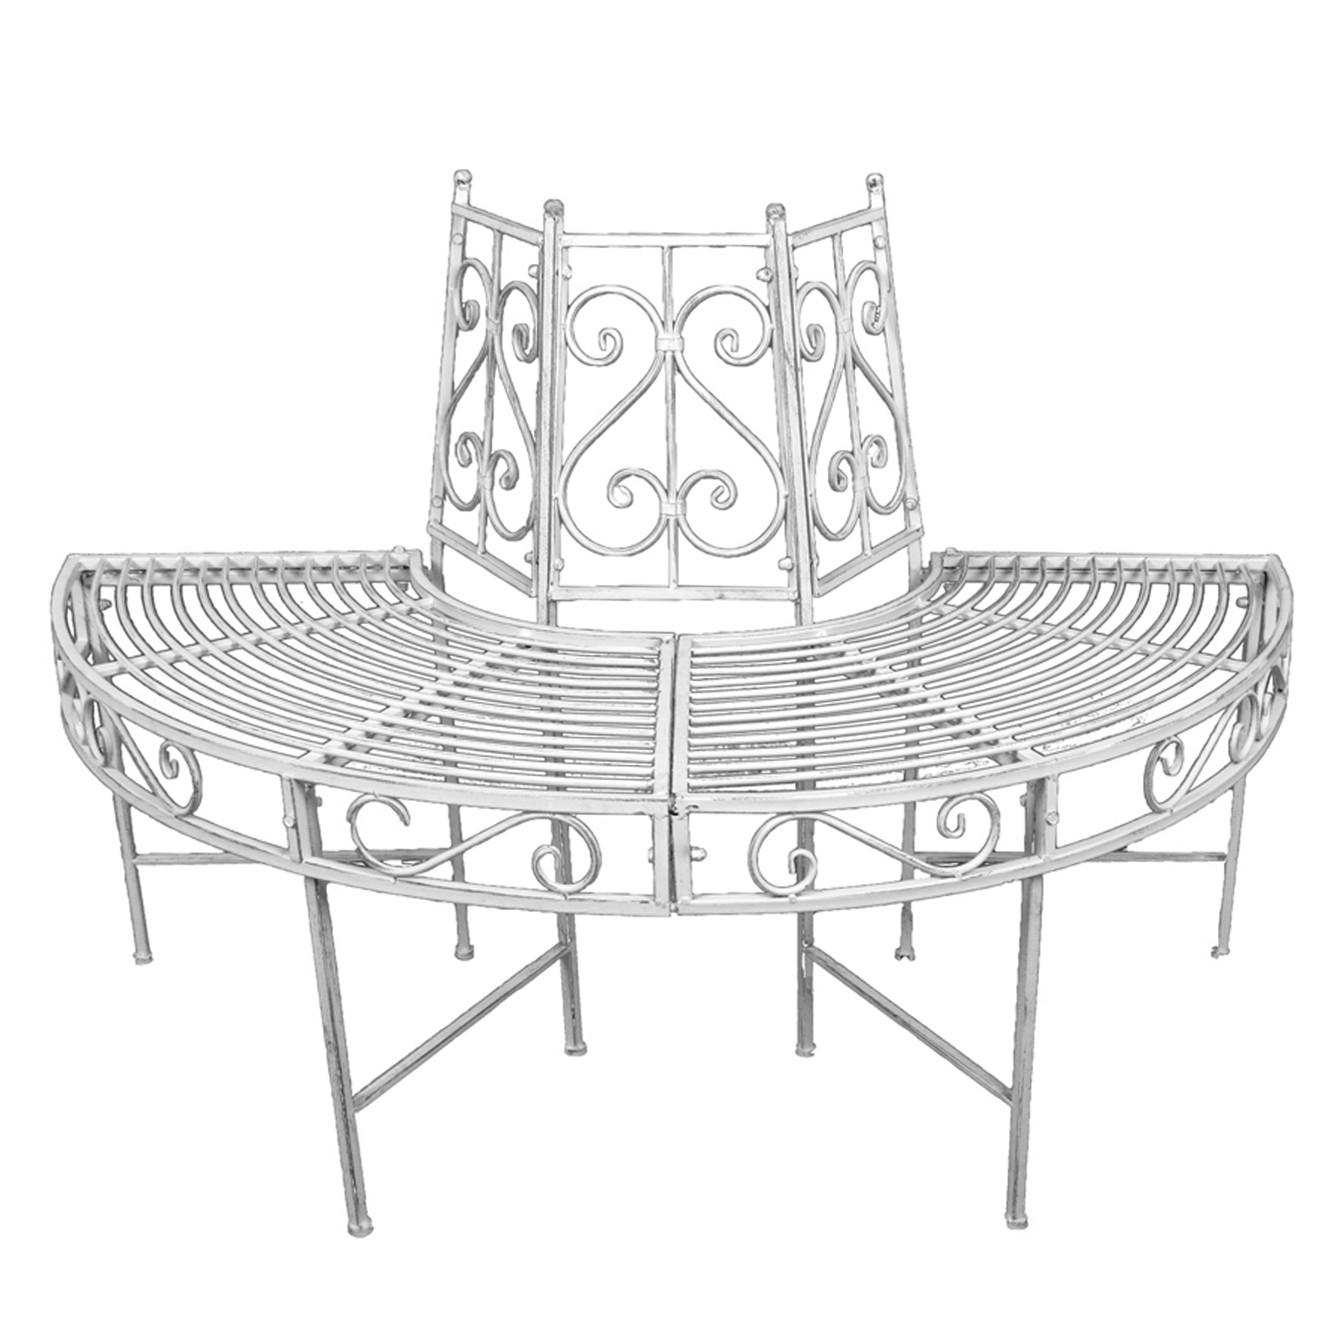 Baumbank Varda - Stahl - Weiß, Garden Pleasure